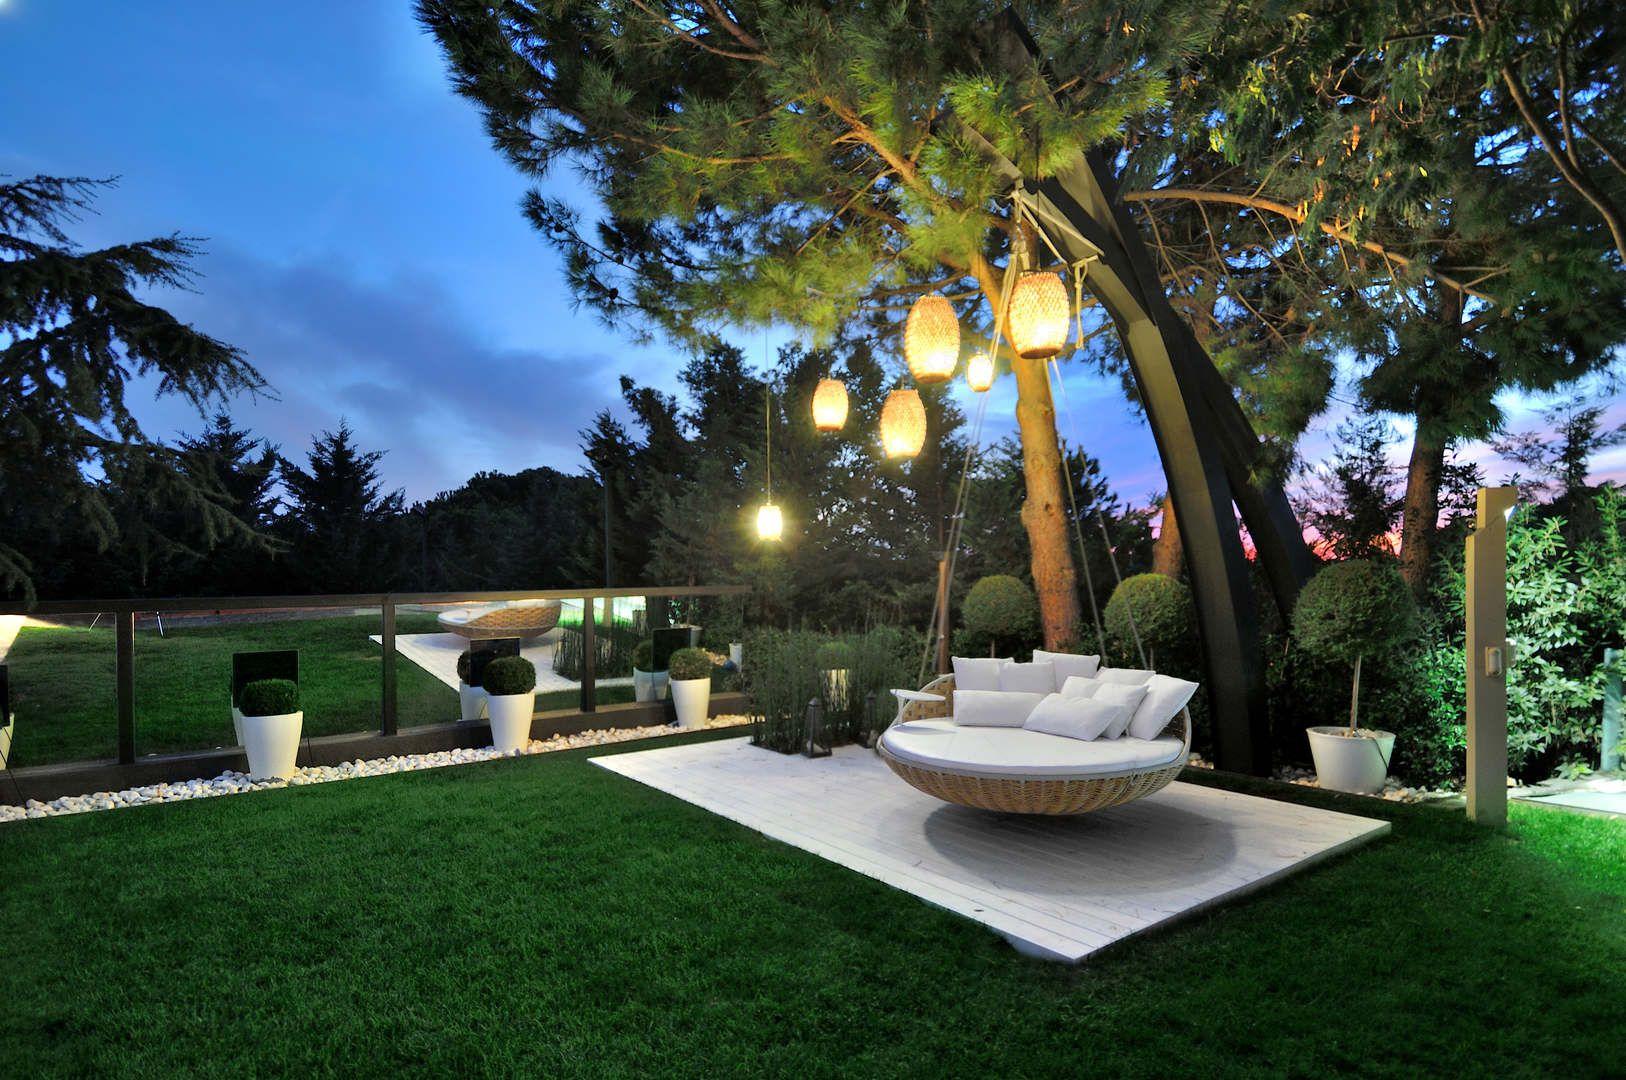 diseño jardin, paisajismo, decoracion jardin